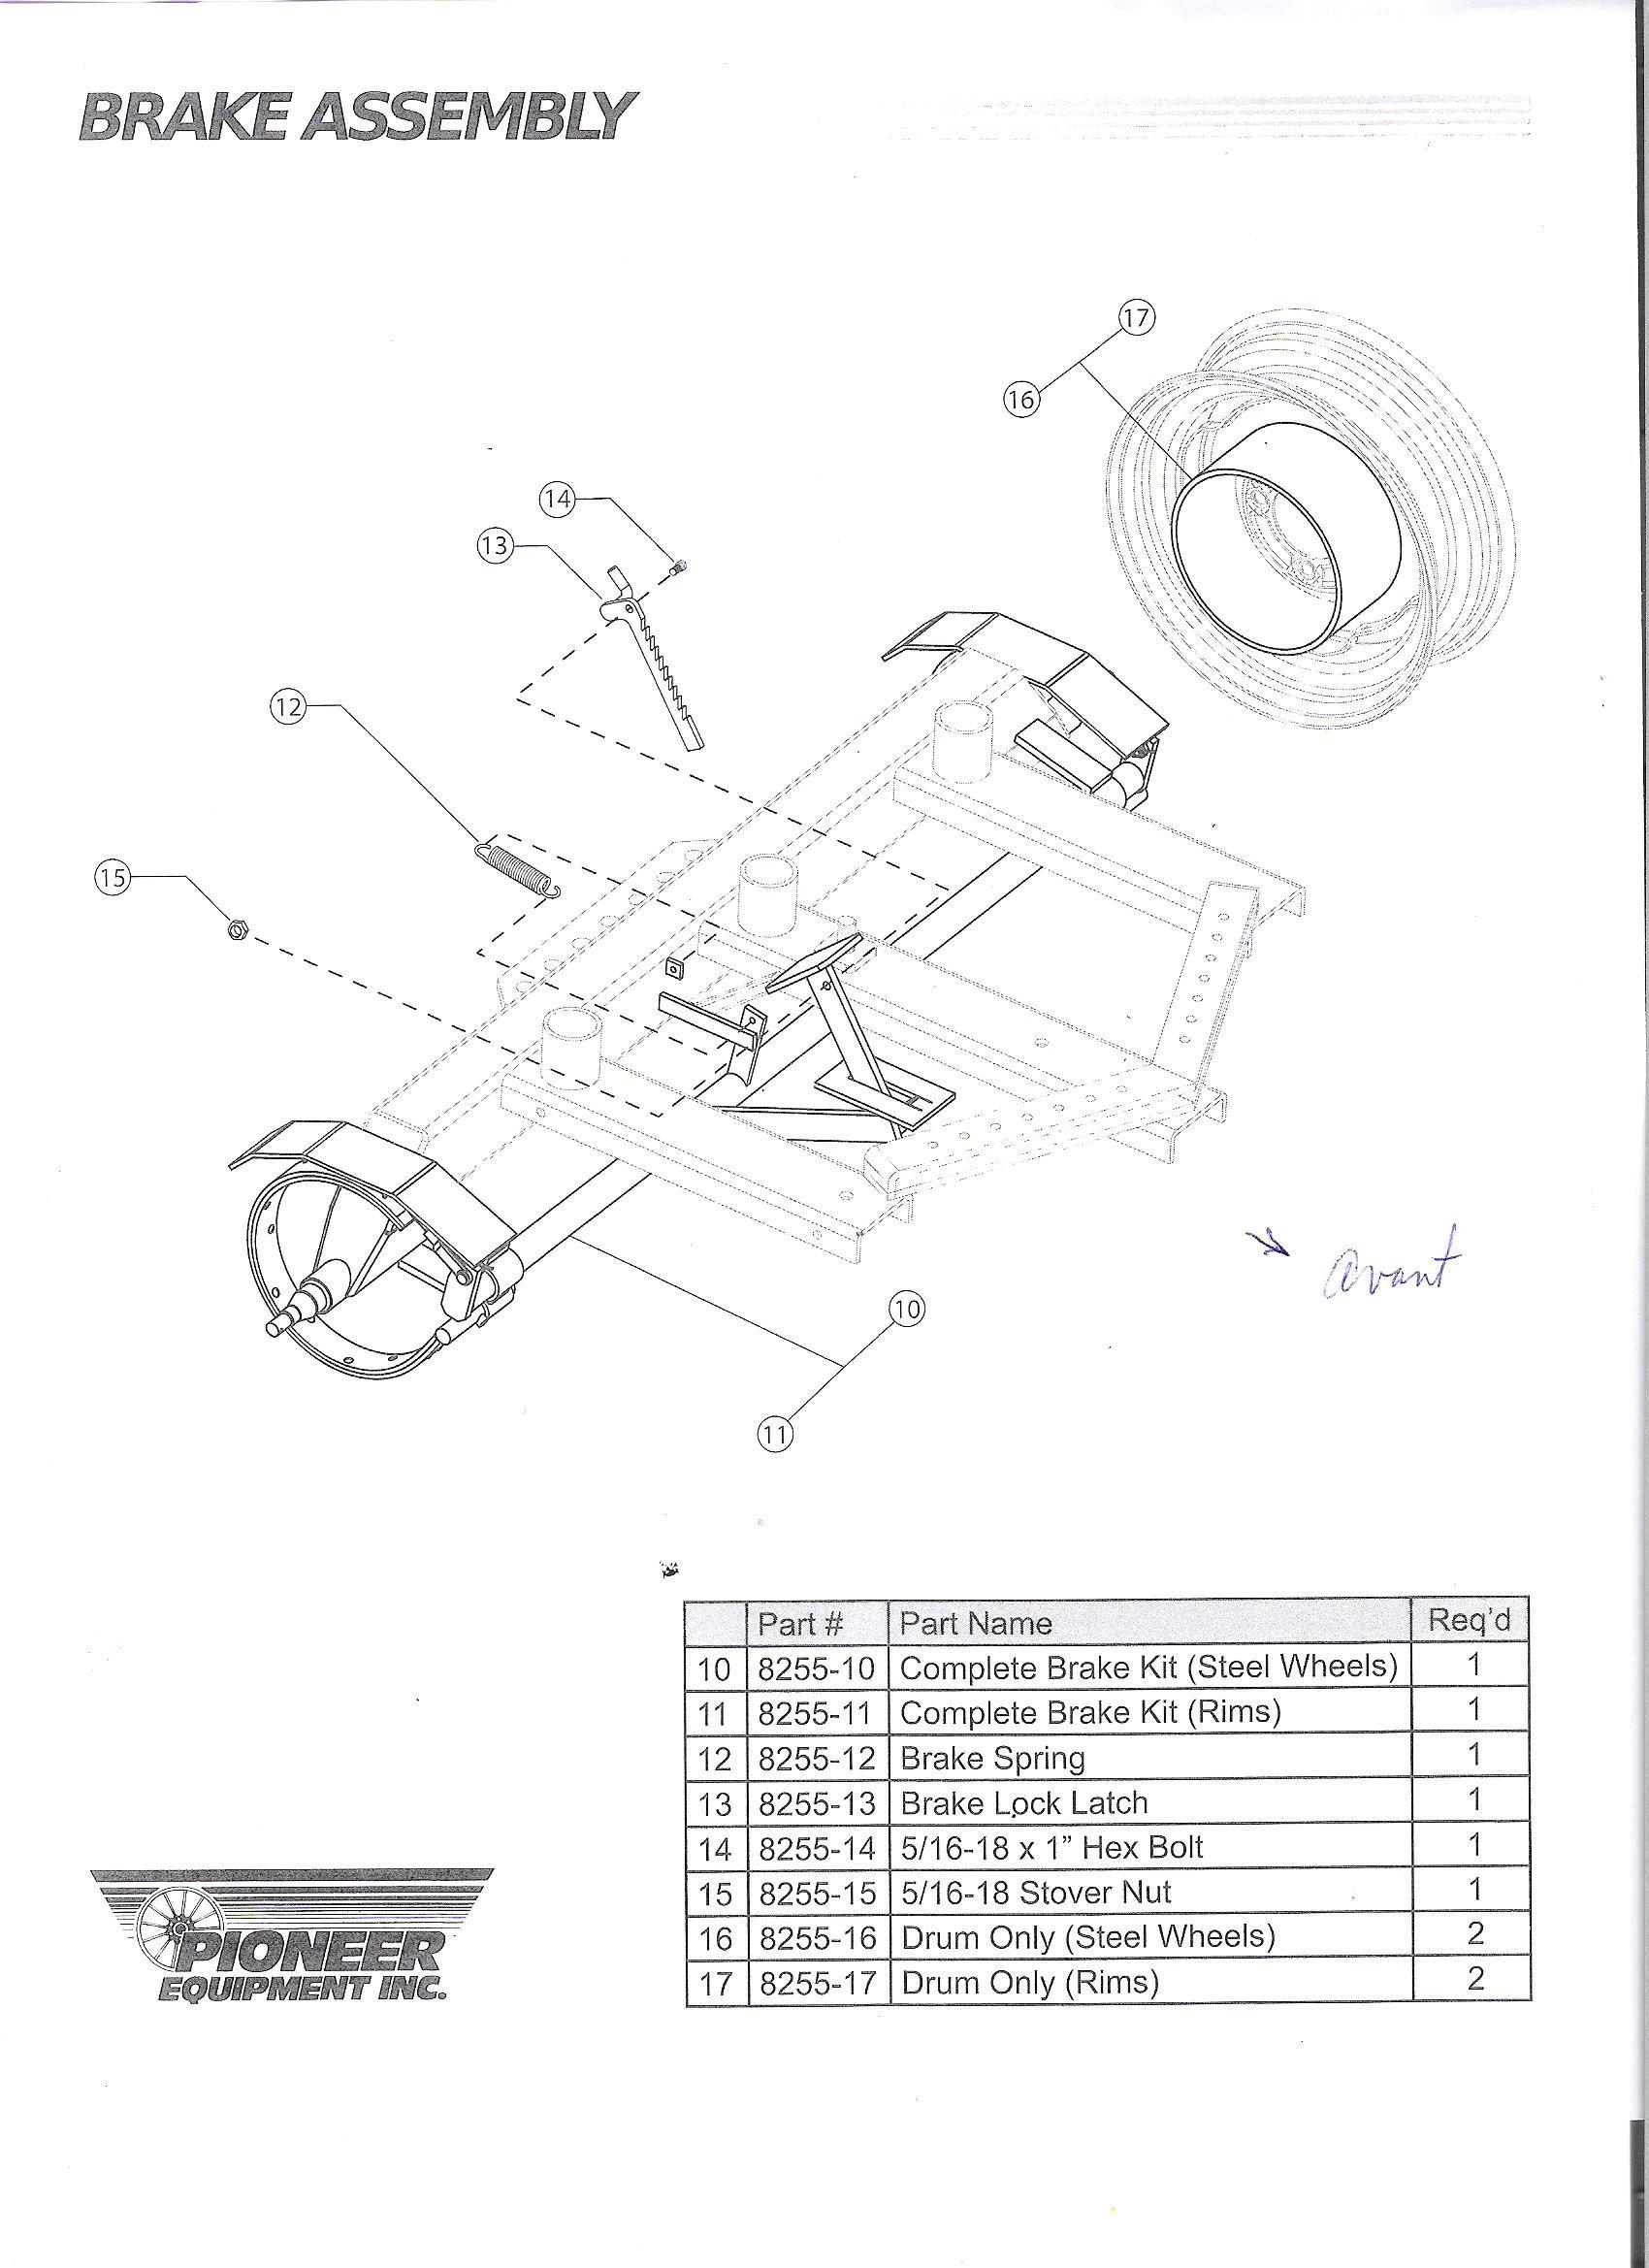 Bought Pioneer Mechanical Brake Kit For Rear Axle Along